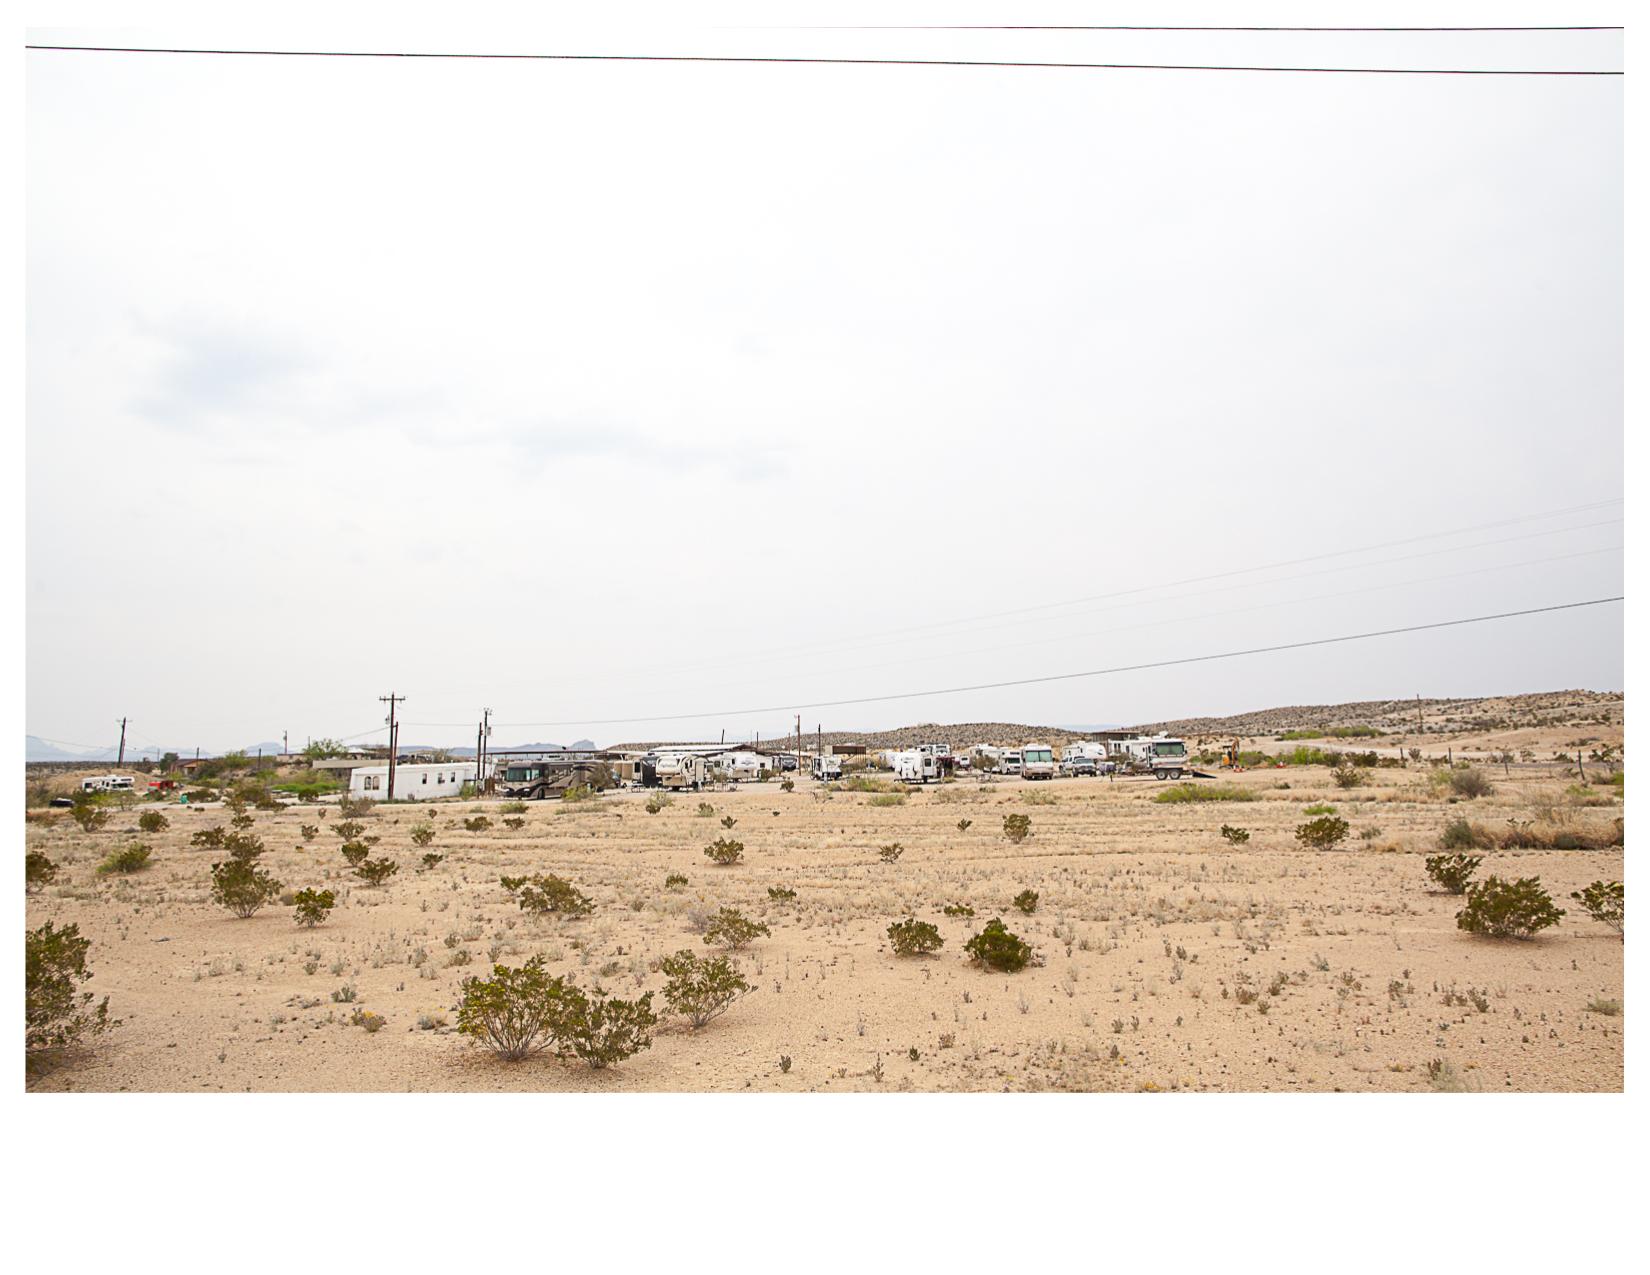 BJ's RV Park, Seen from TX 170, Terlingua, TX